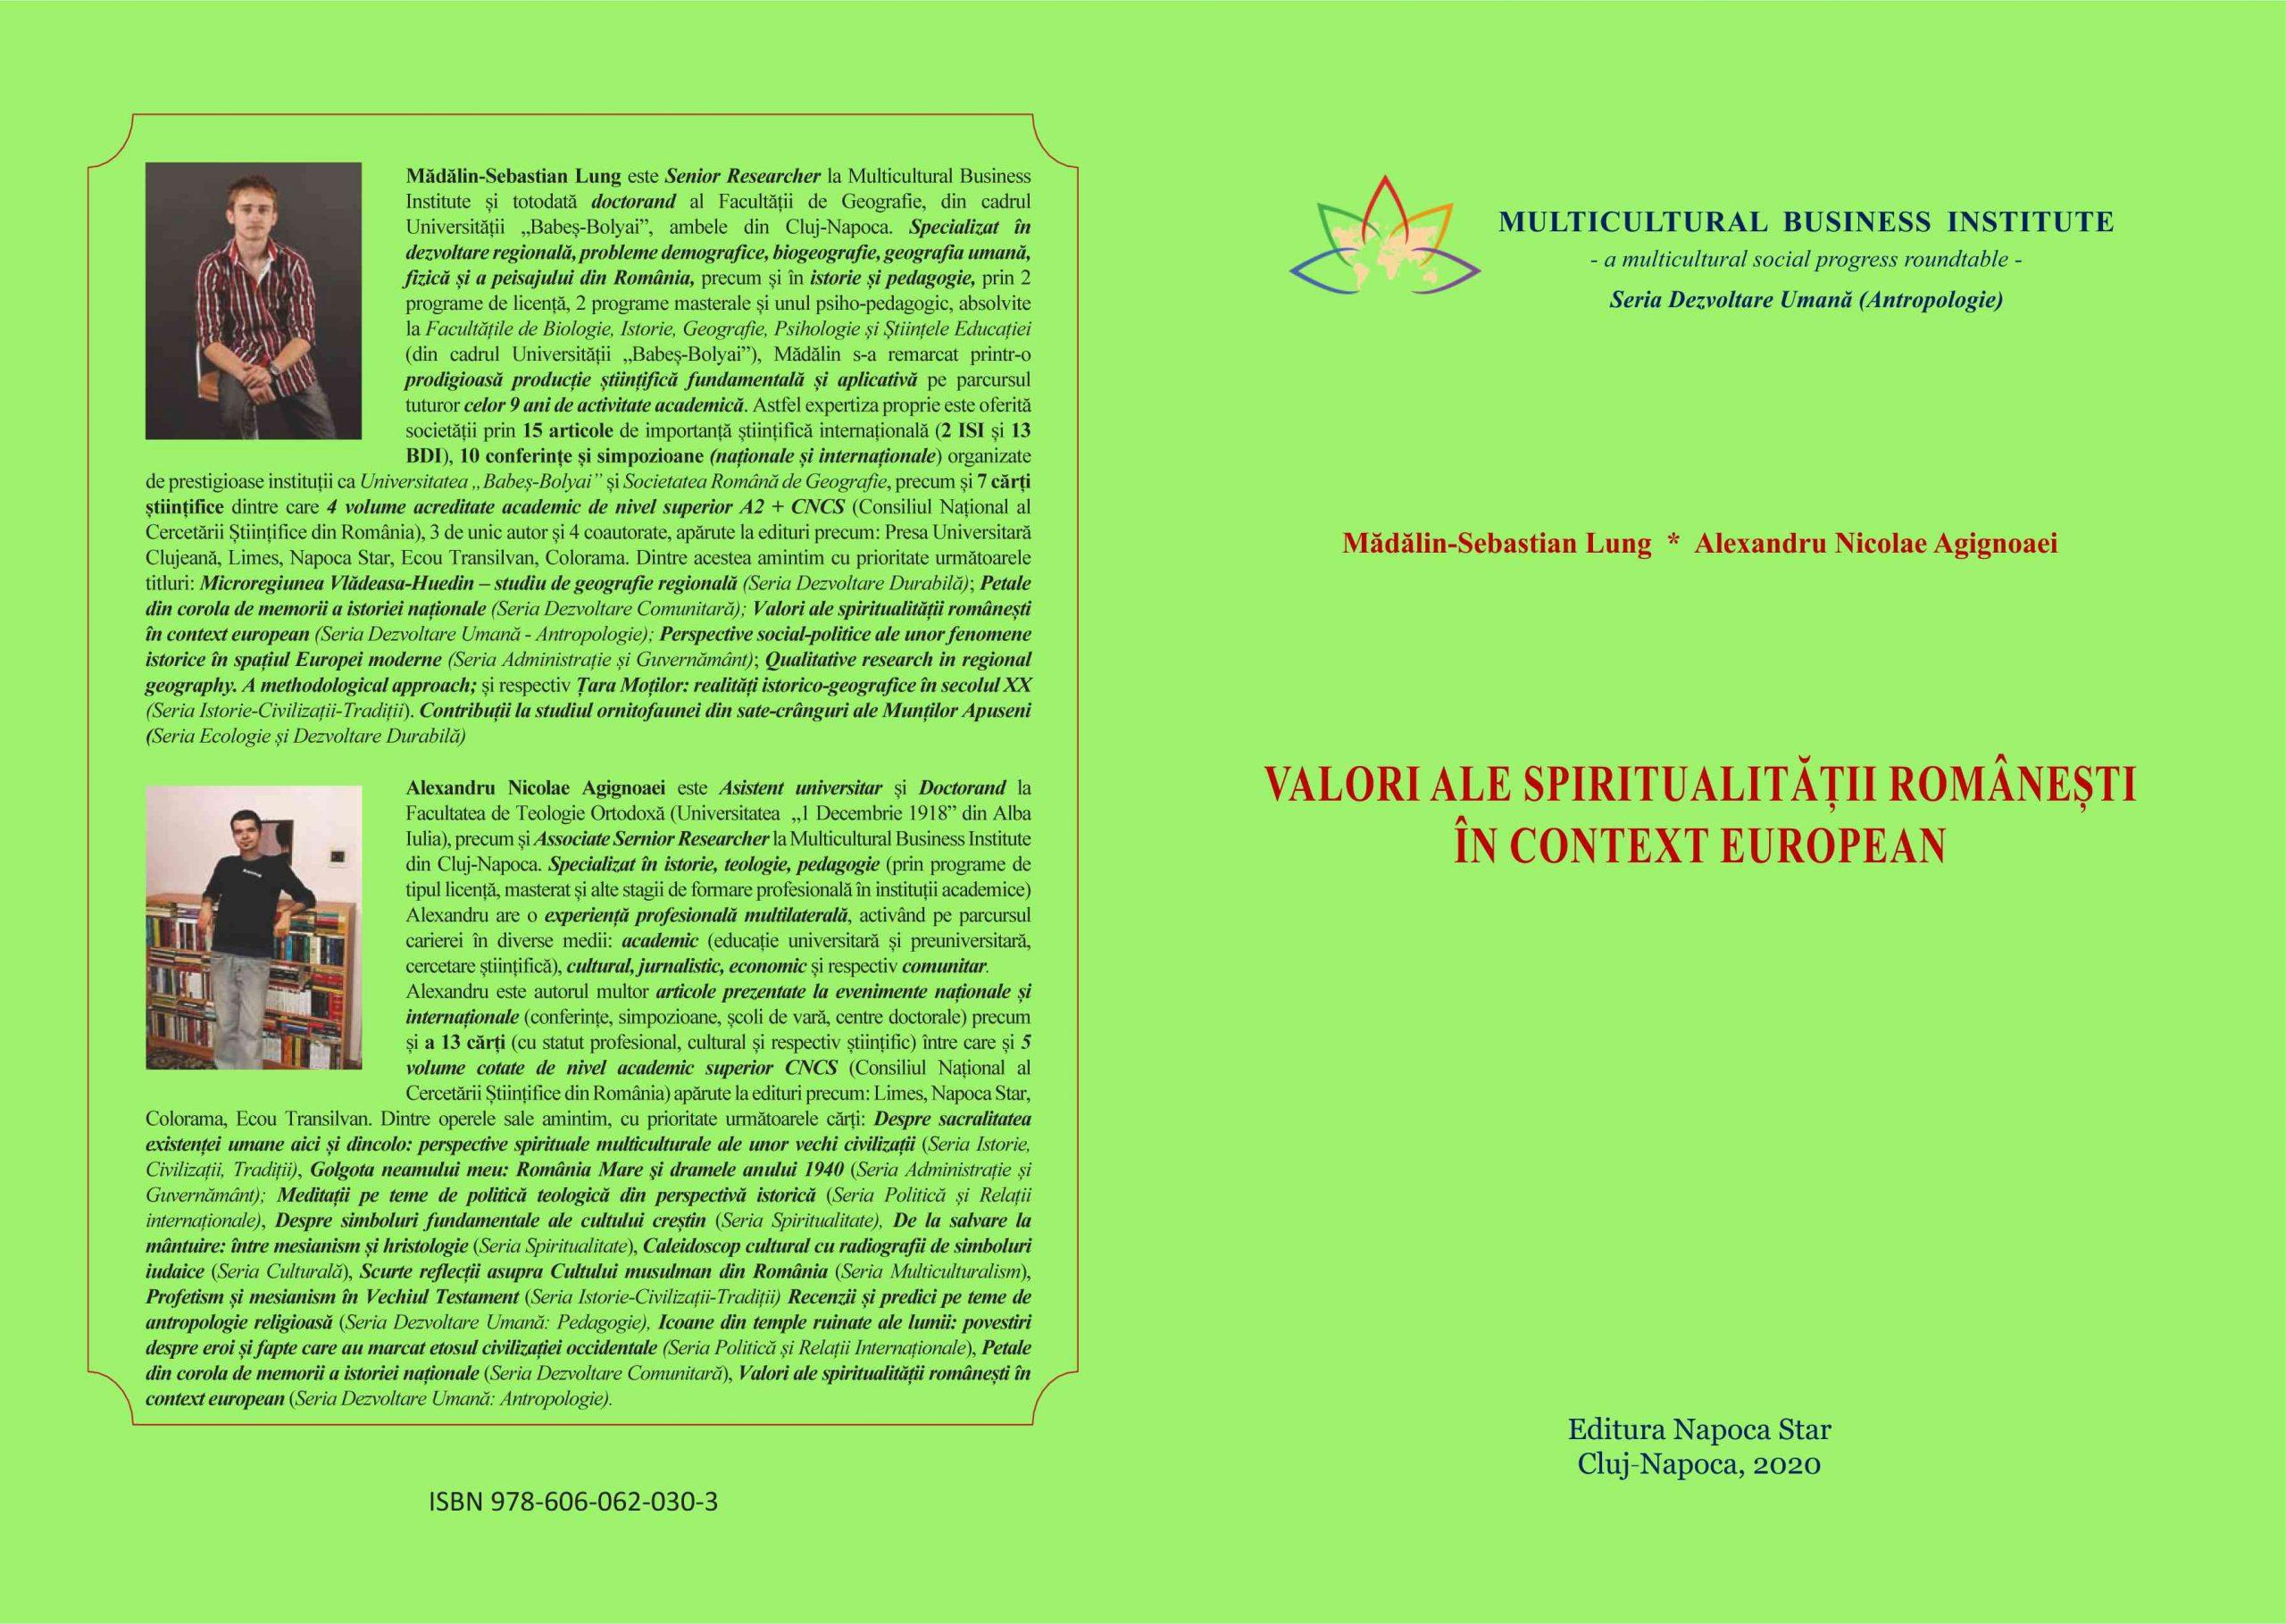 Coperta Lung &Agignoaei - Valori ale spiritualității românești